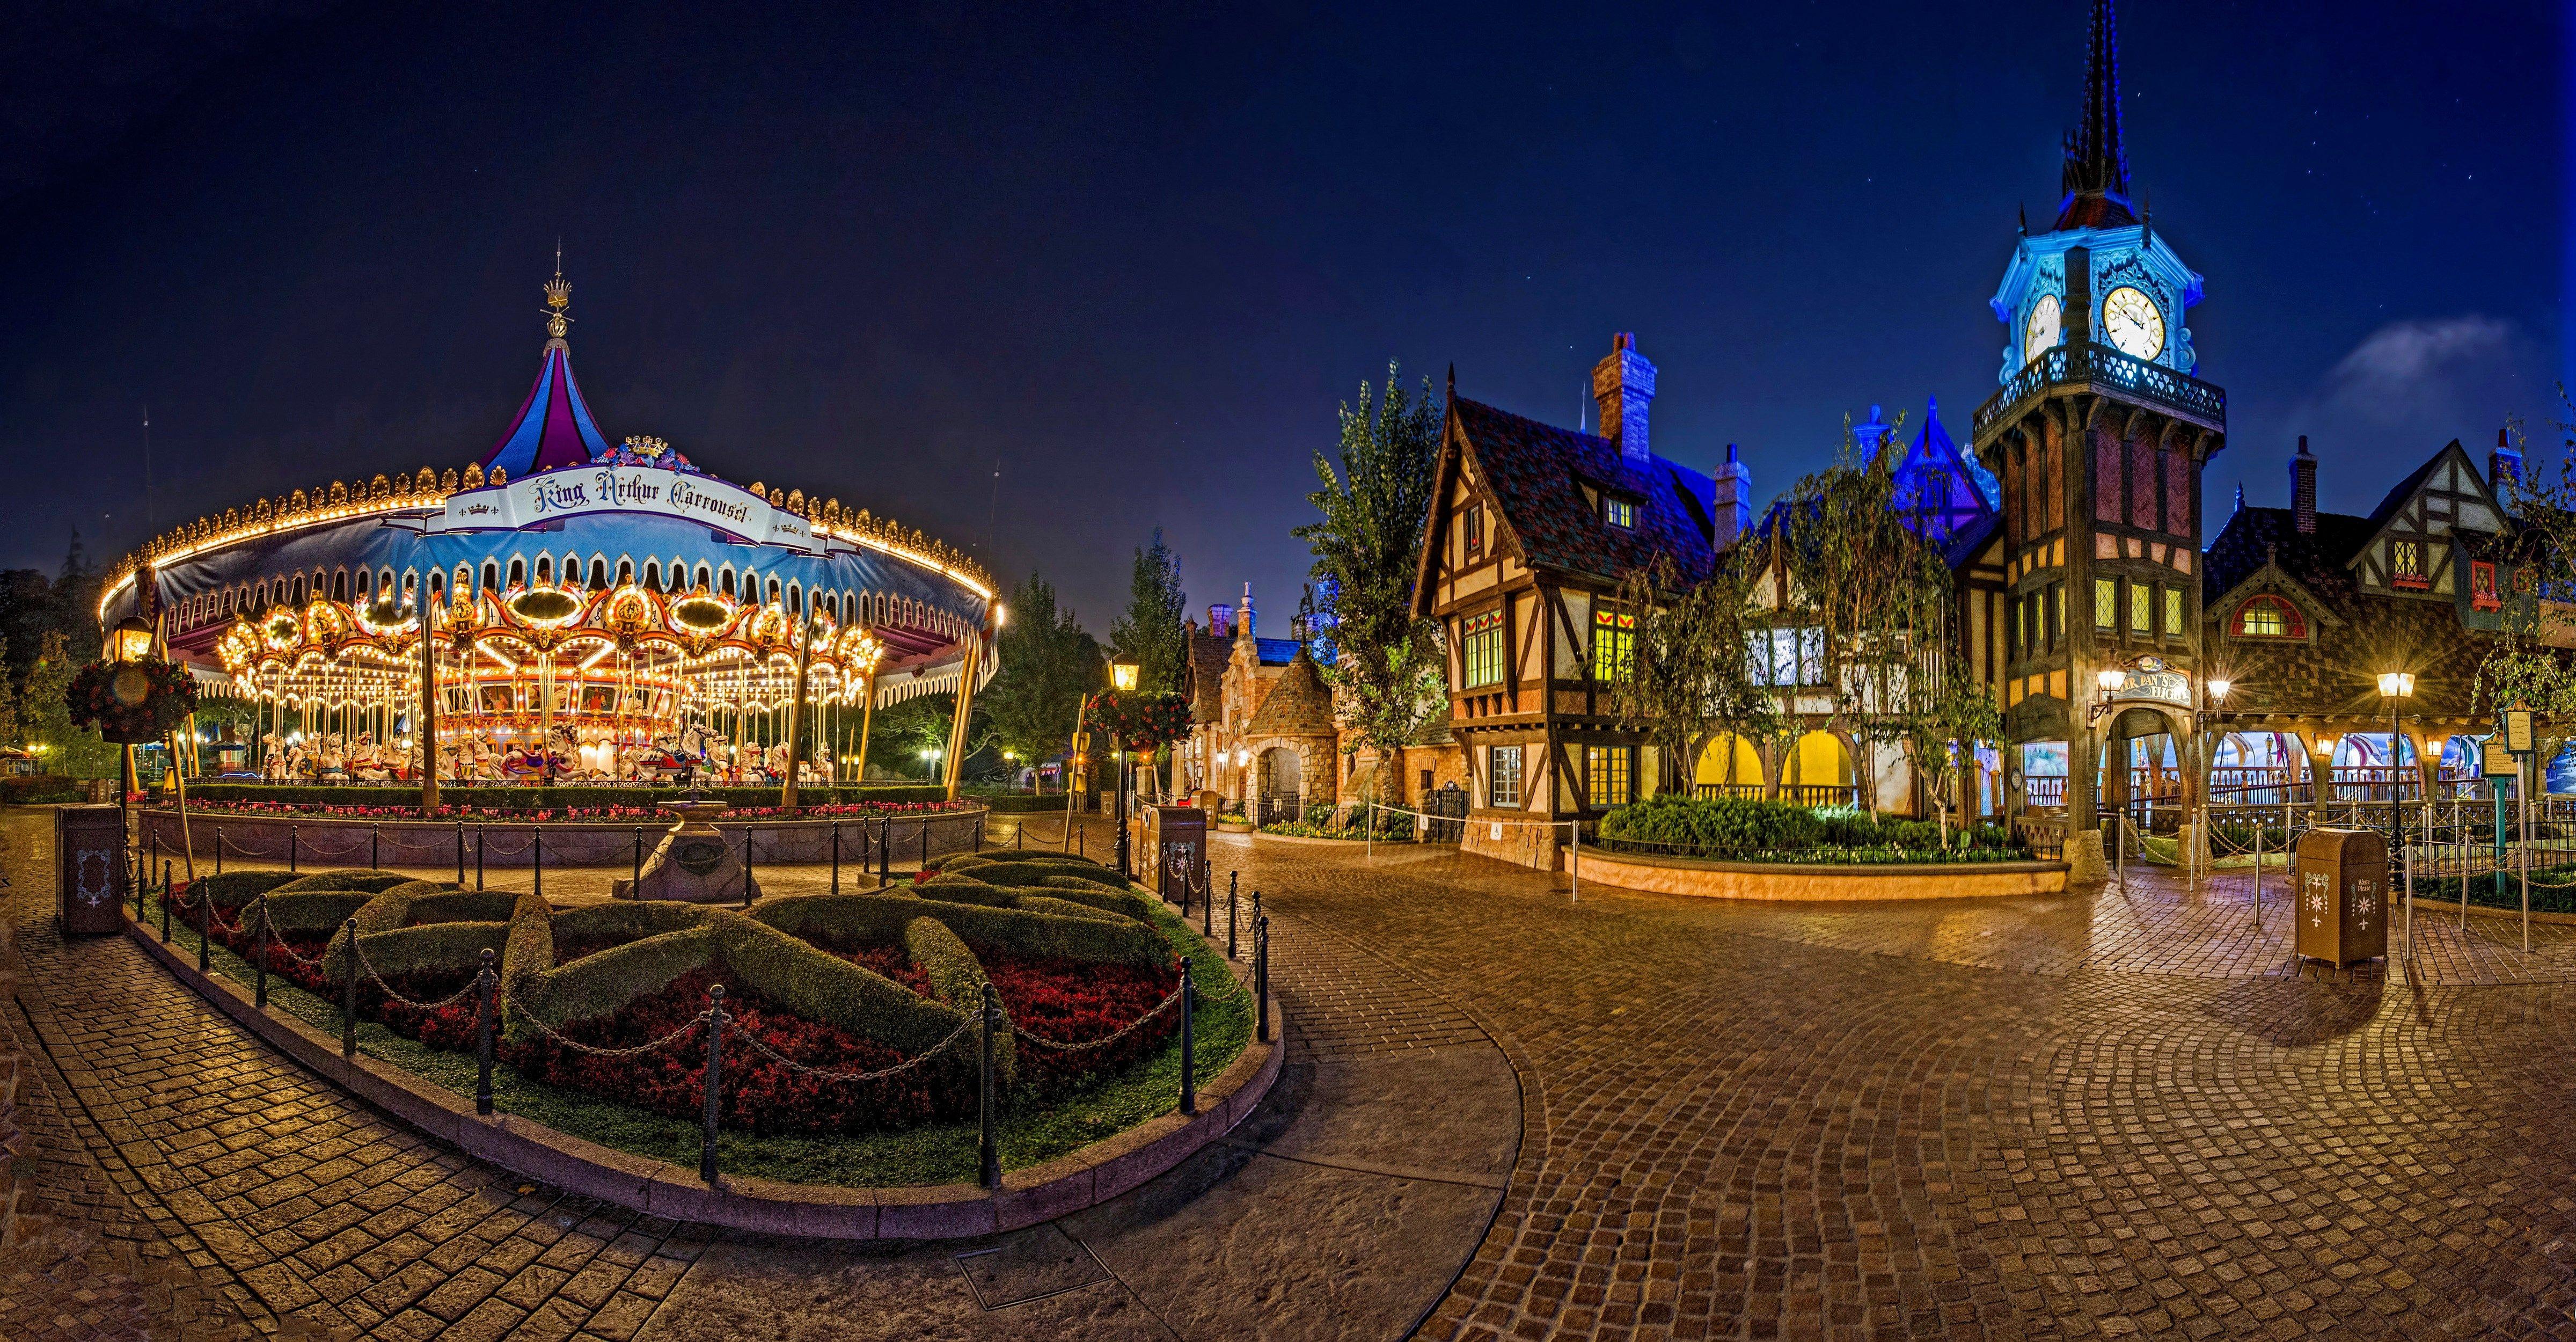 Disneyland Hd Wallpaper